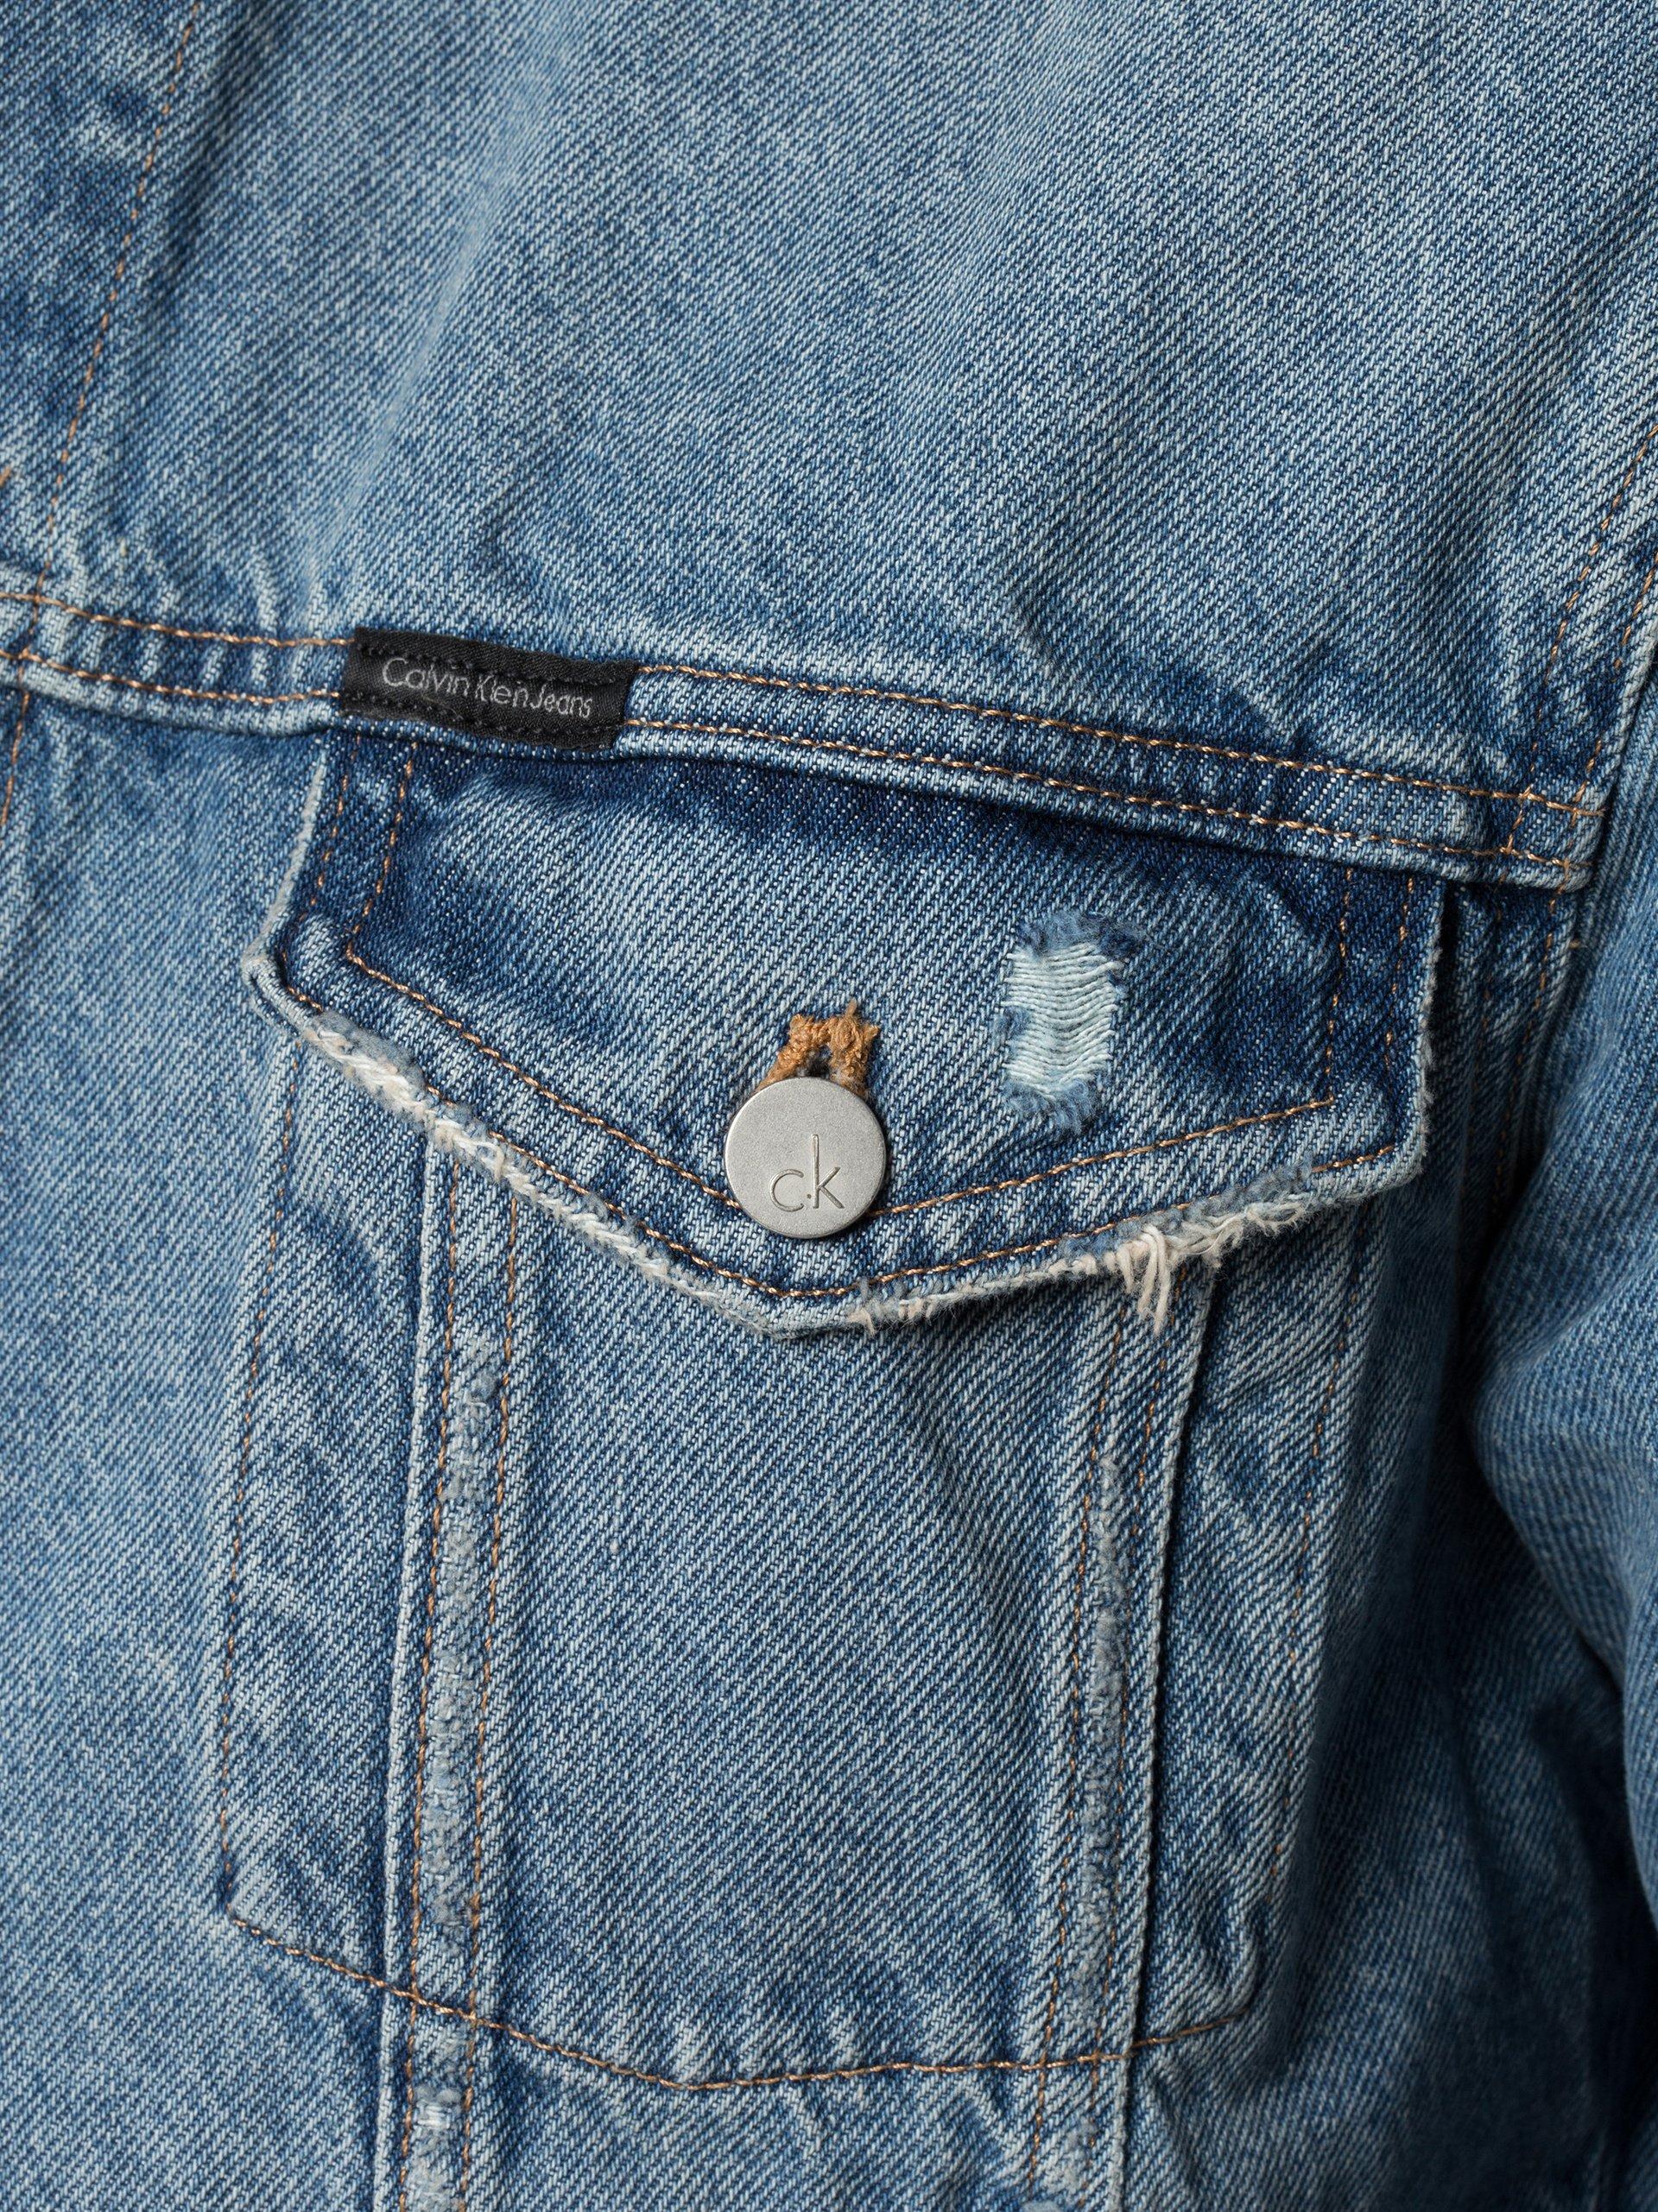 calvin klein jeans herren jeansjacke indigo uni online kaufen vangraaf com. Black Bedroom Furniture Sets. Home Design Ideas